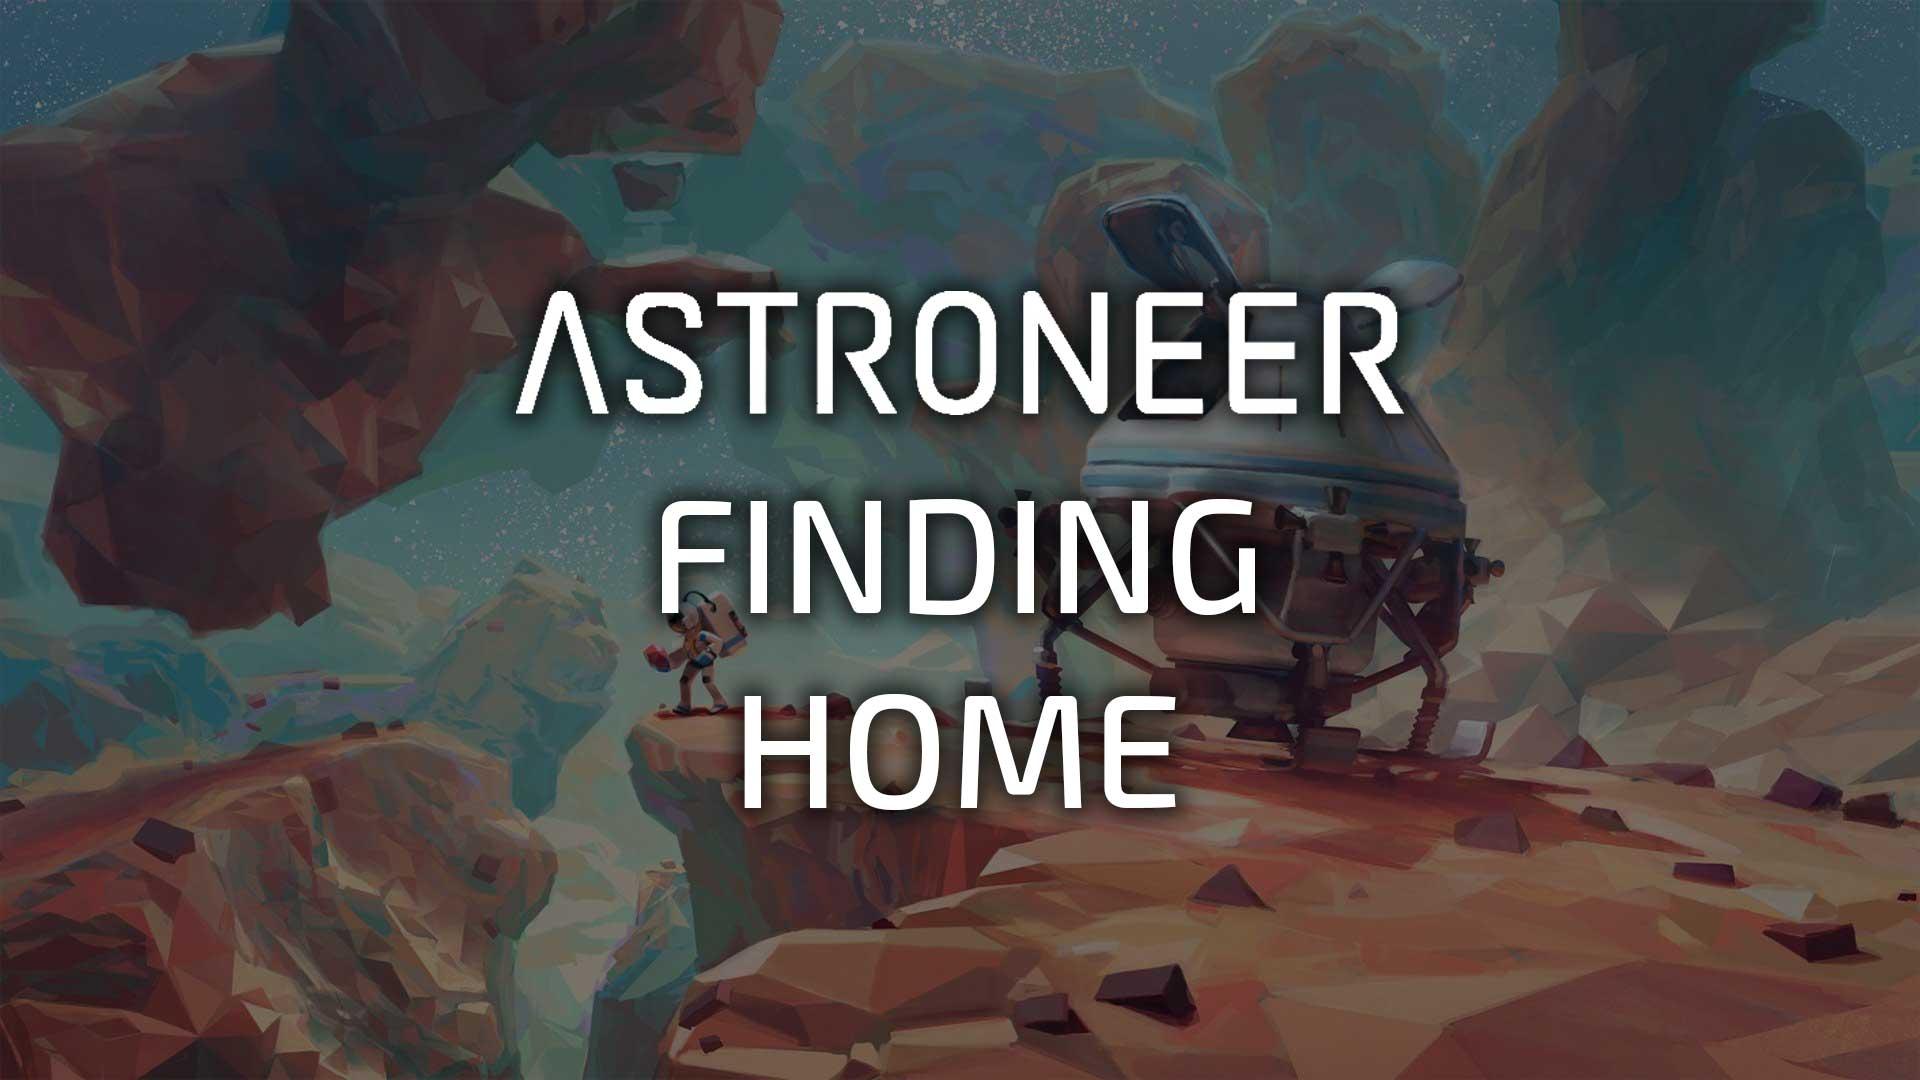 astroneer lost